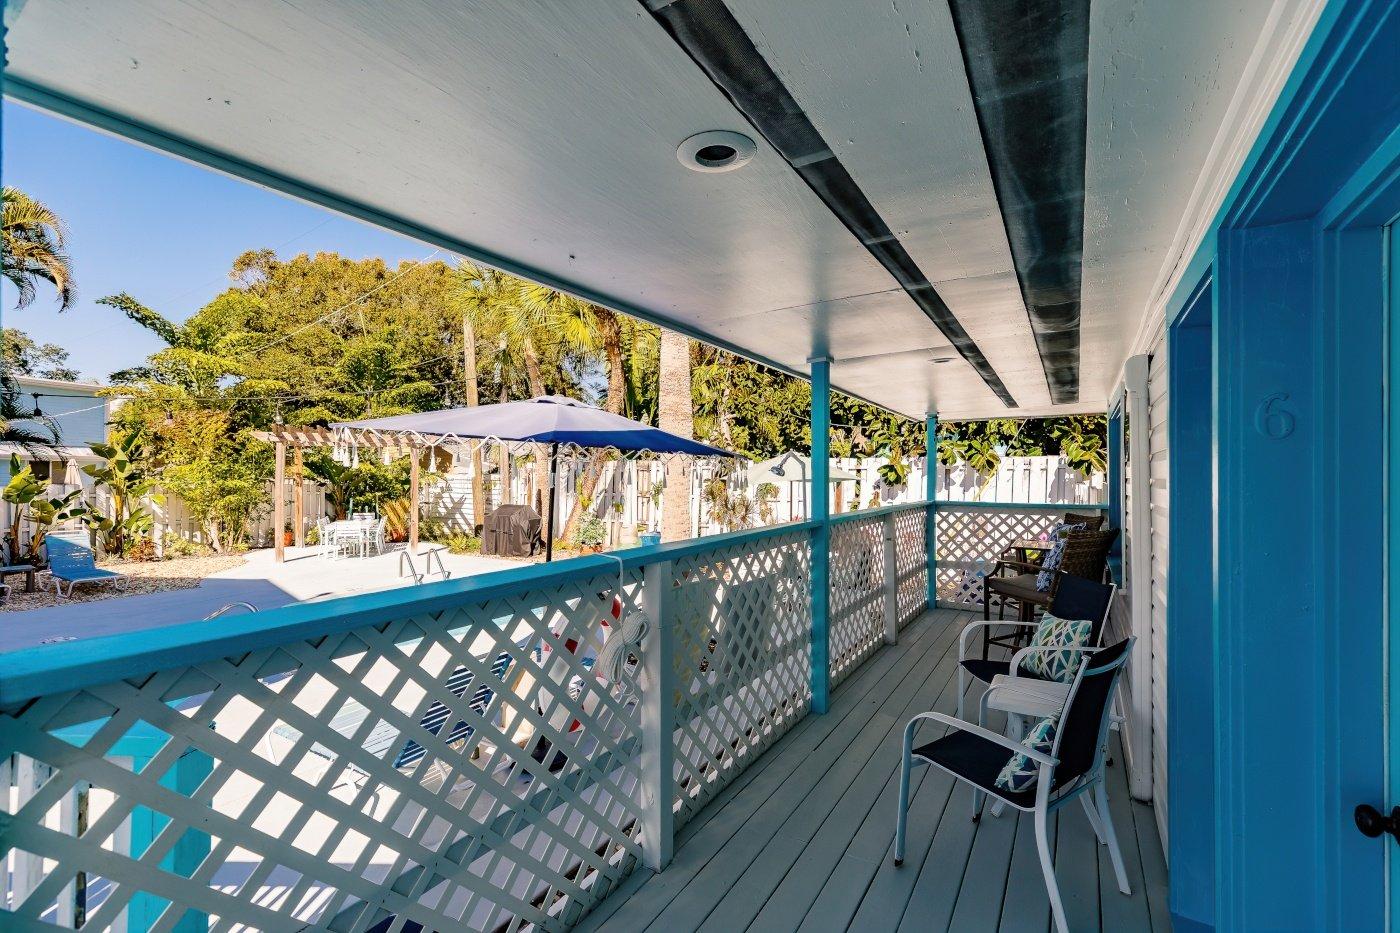 The Cabana, Patio and Pool